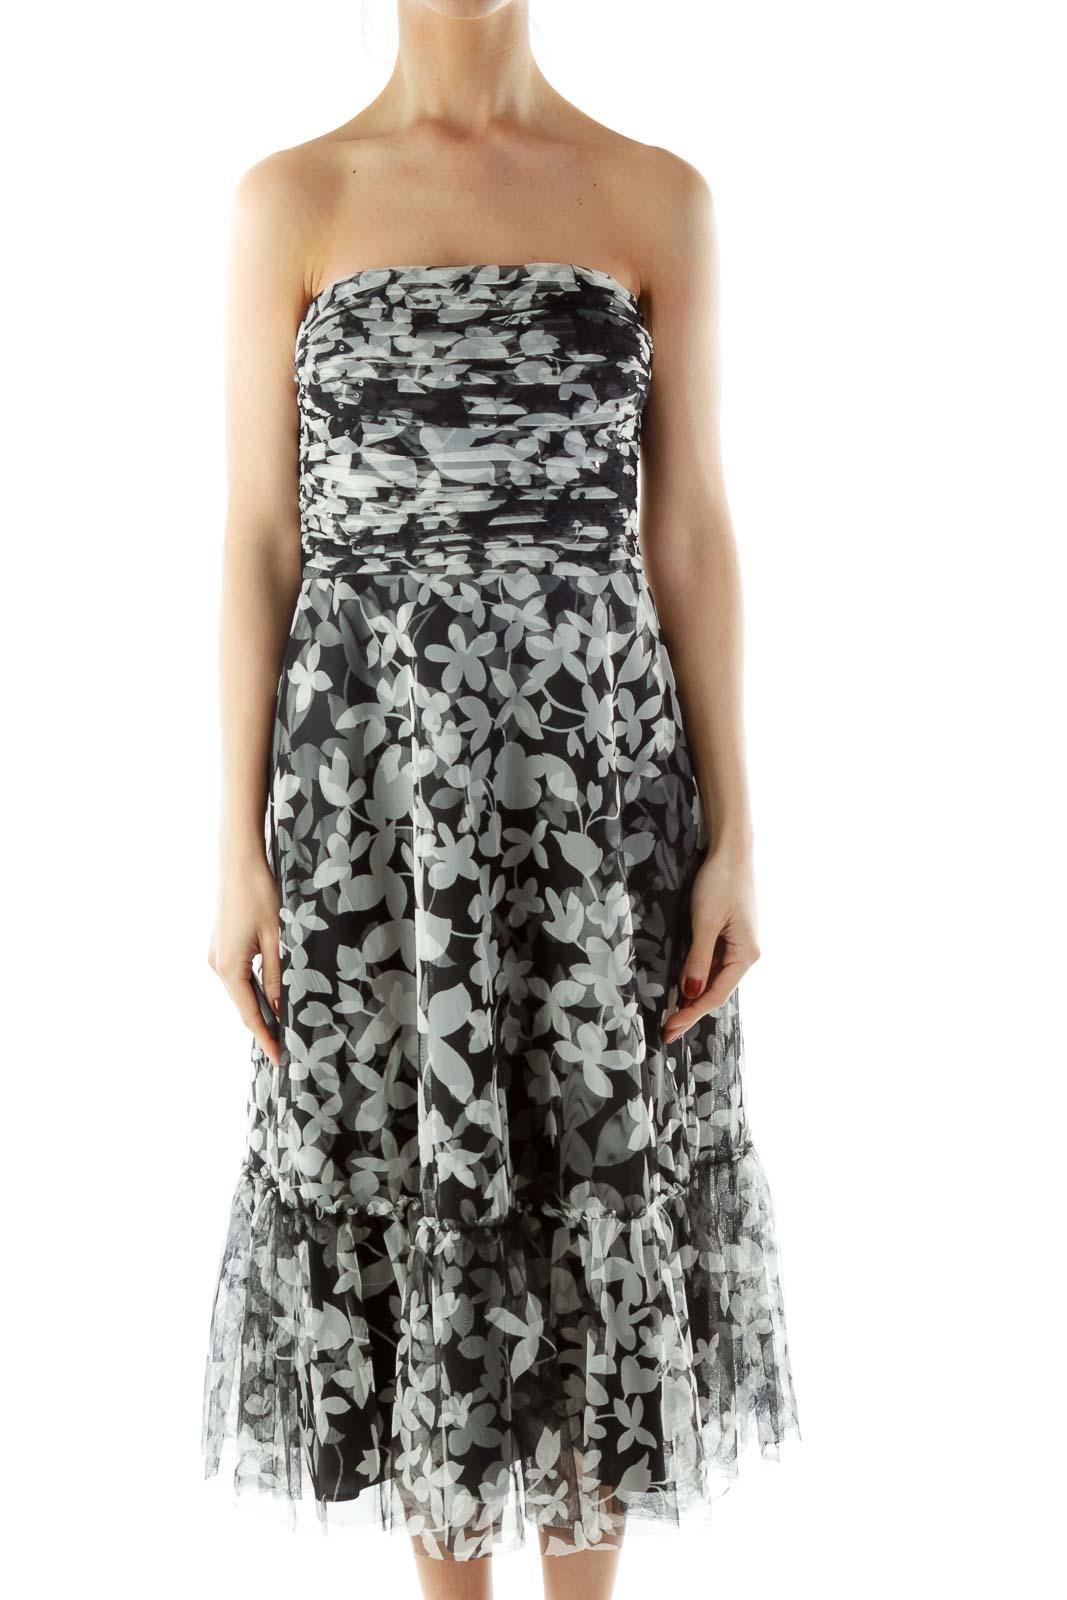 Black White Strapless Print Cocktail Dress